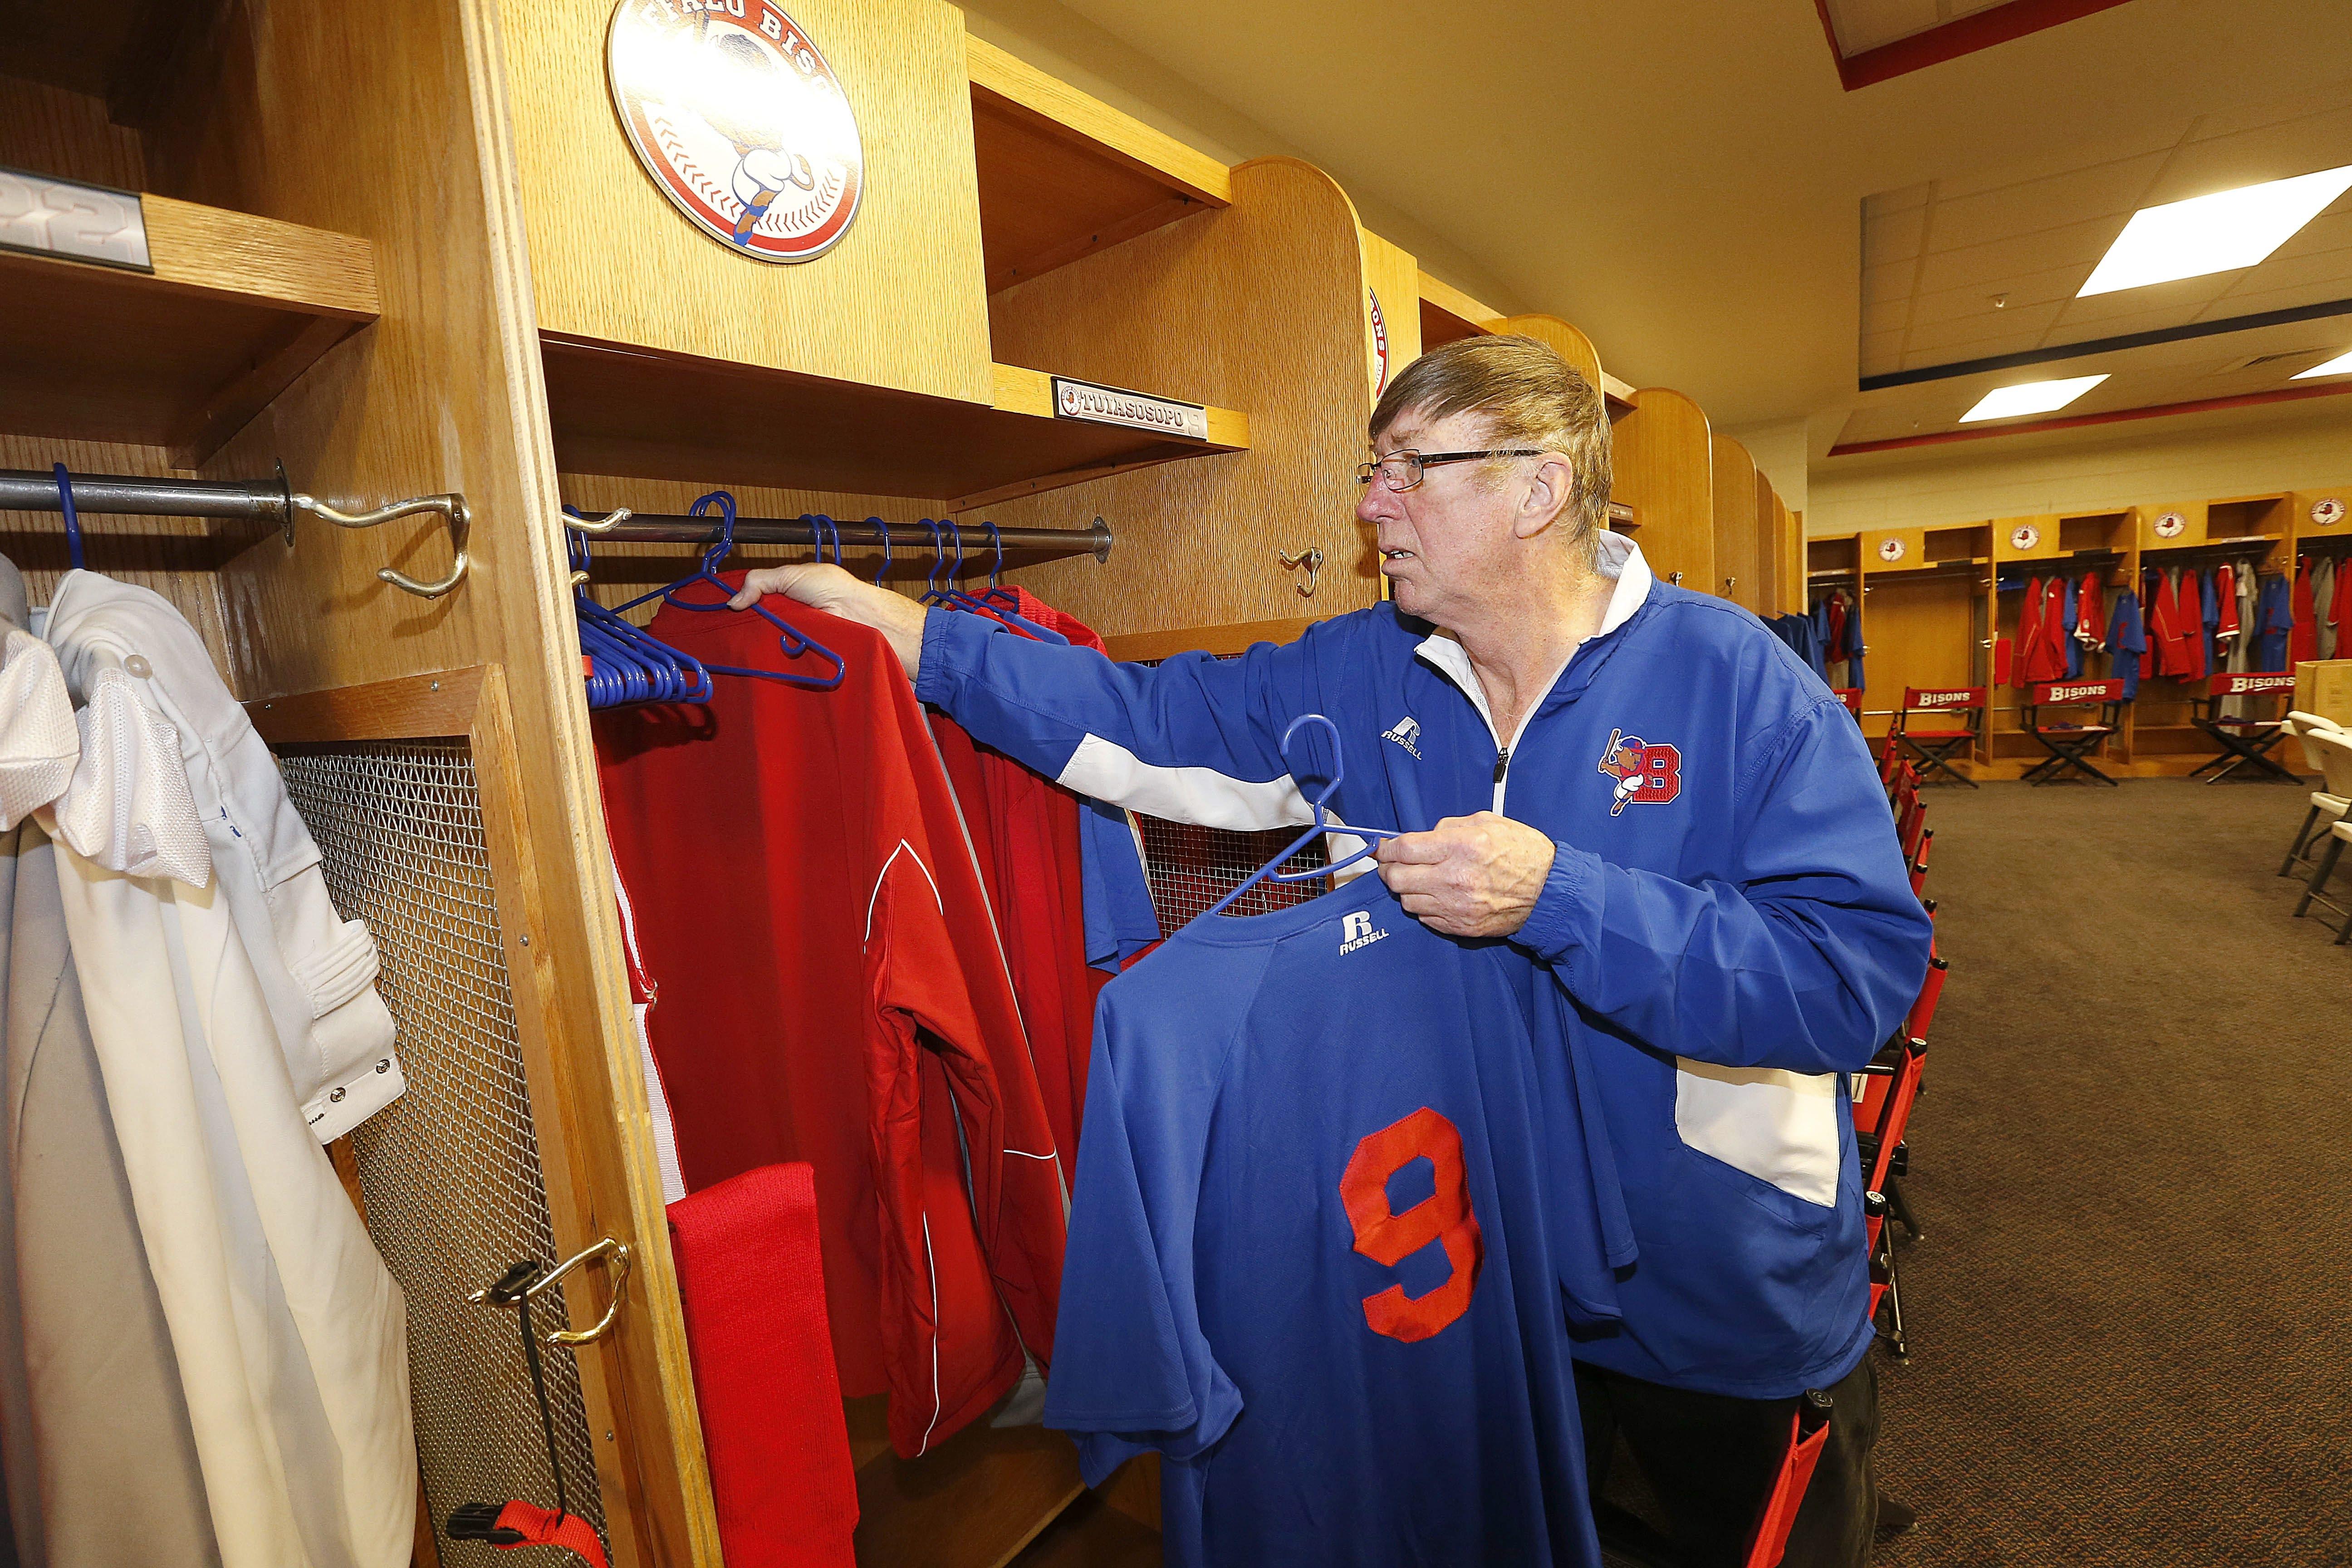 Club house assistant Bob Decker hangs up a Buffalo Bison uniform for Matt Tuiasospo in his locker at Coca-Cola Field.